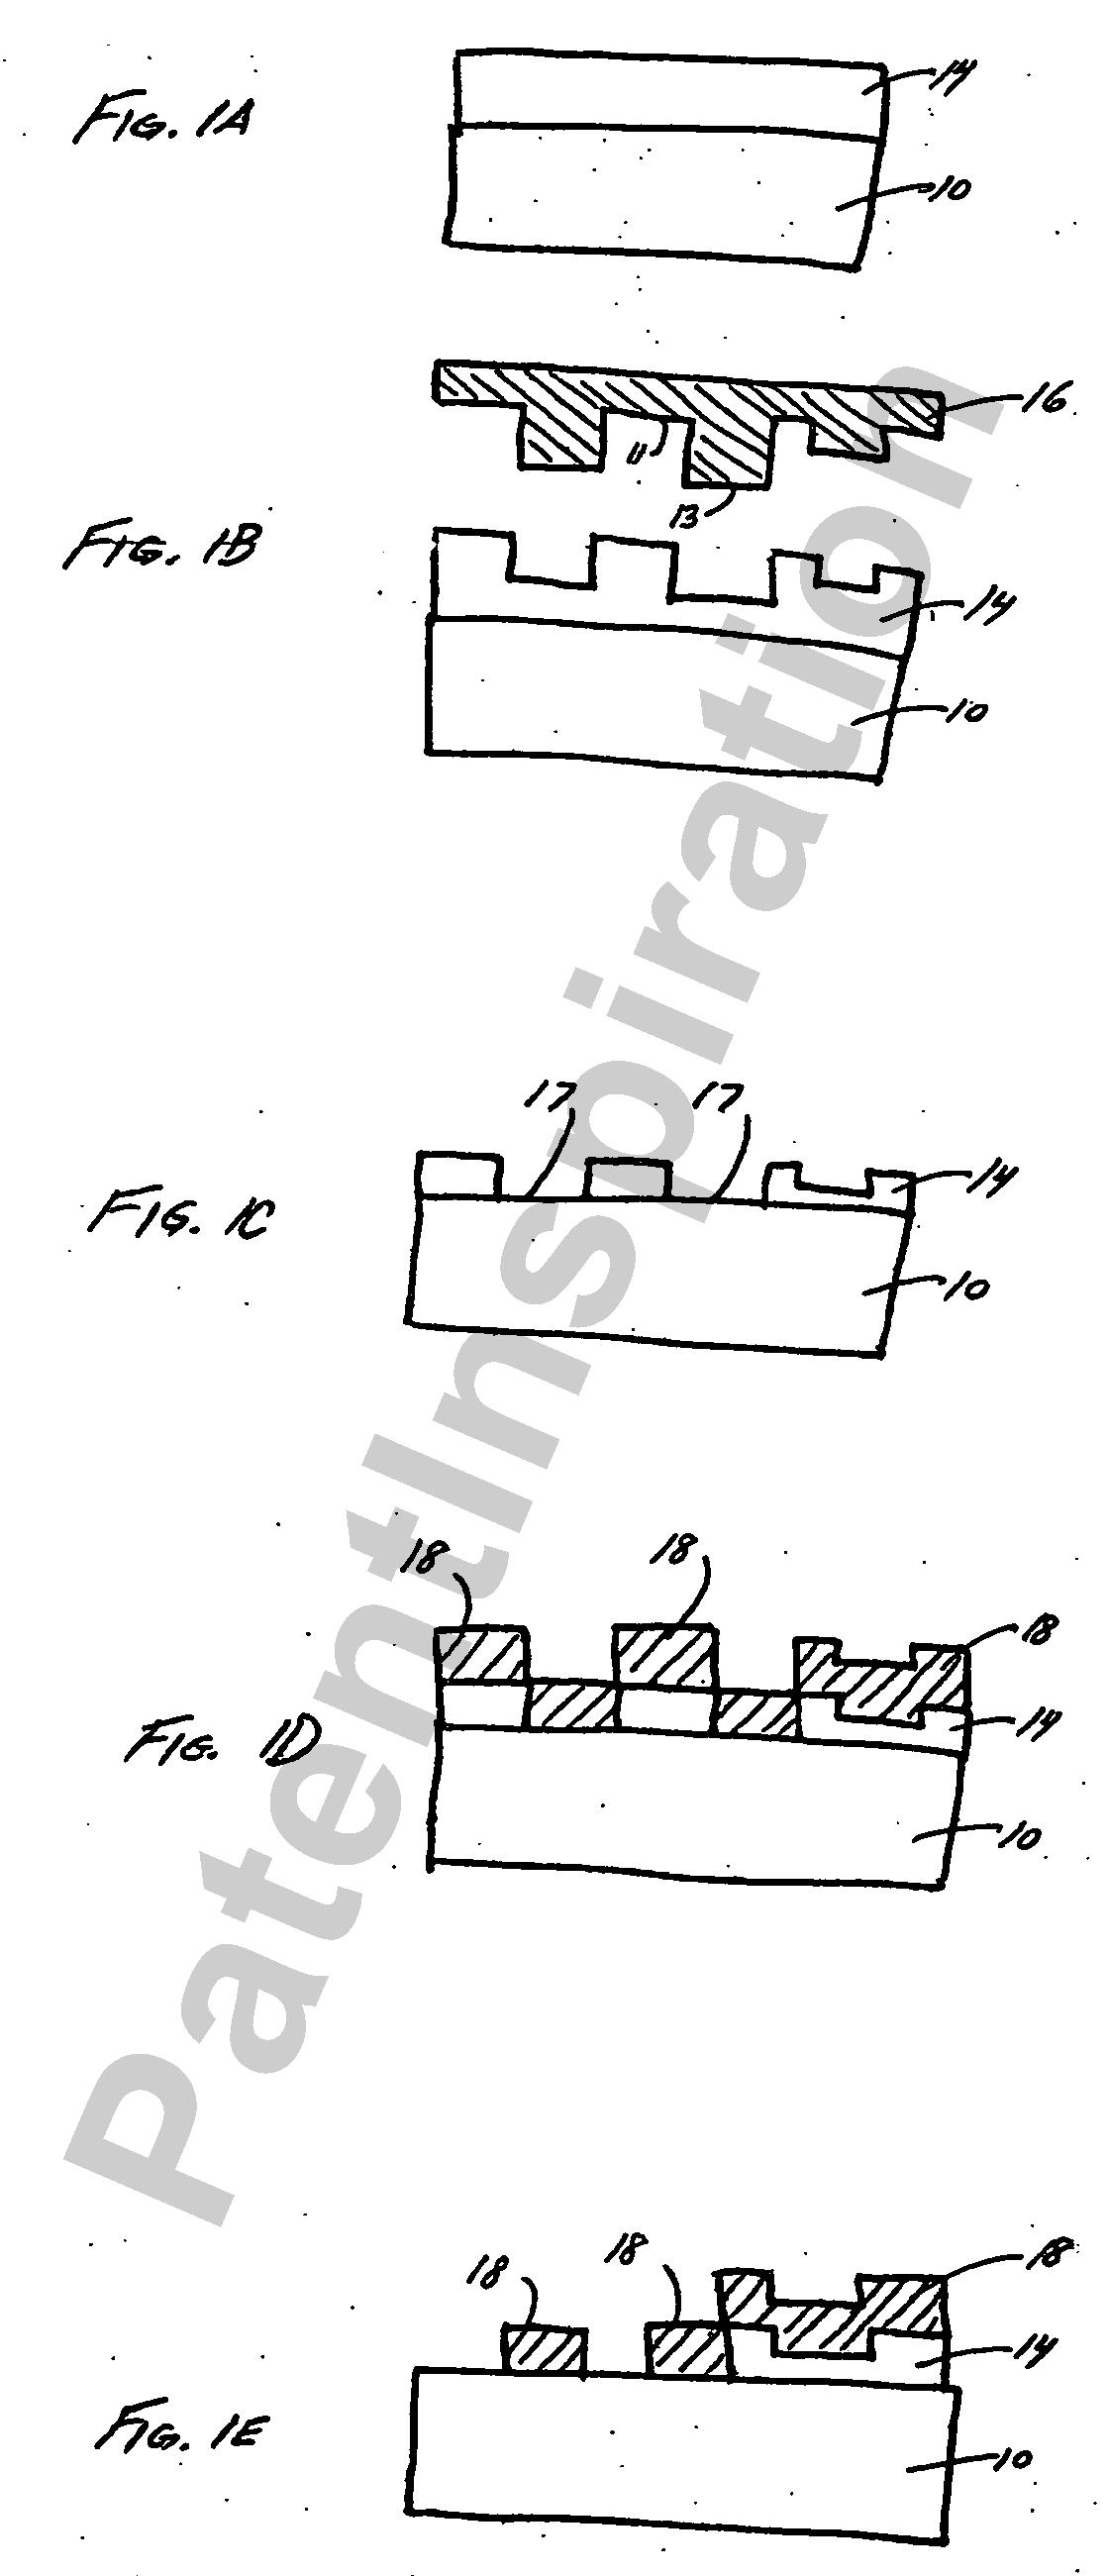 Blodgett Dfg 50 Wiring Diagram : 30 Wiring Diagram Images